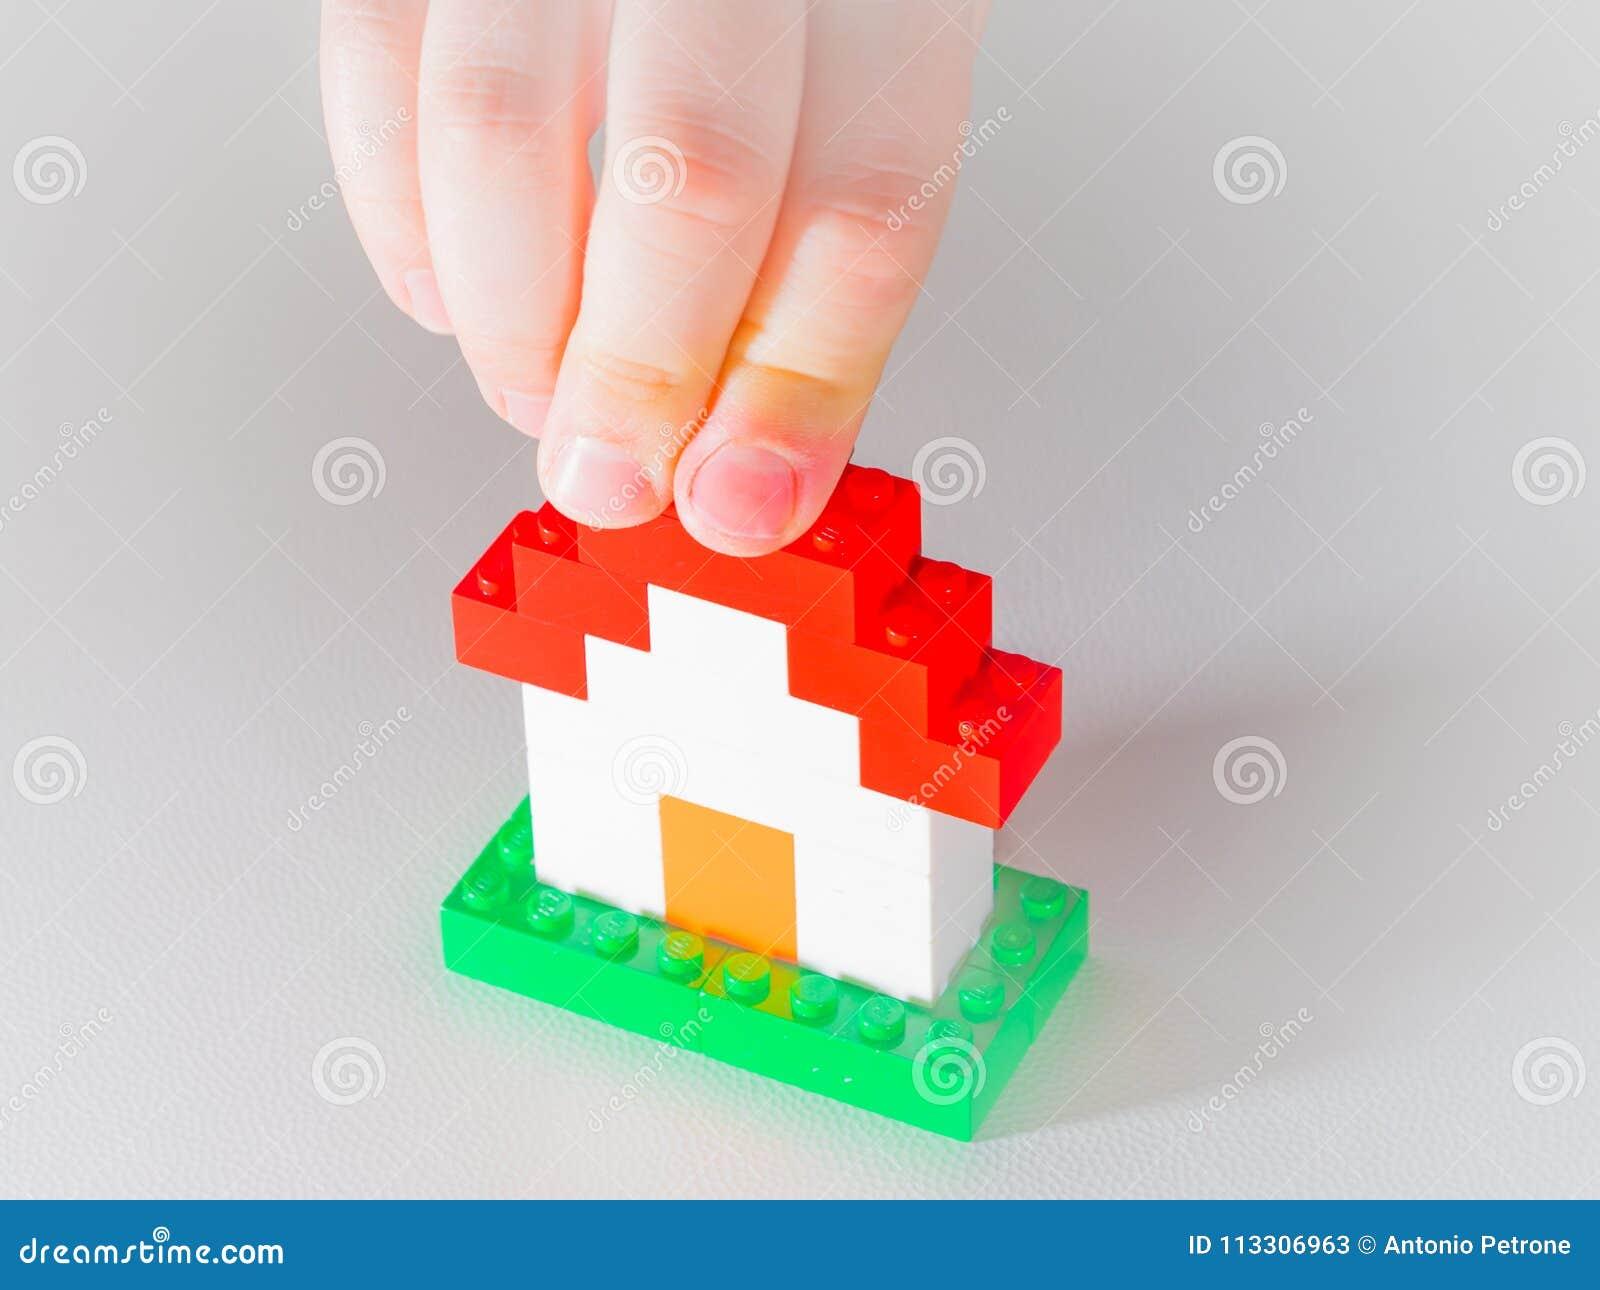 Lego house editorial stock photo  Image of italy, estate - 113306963